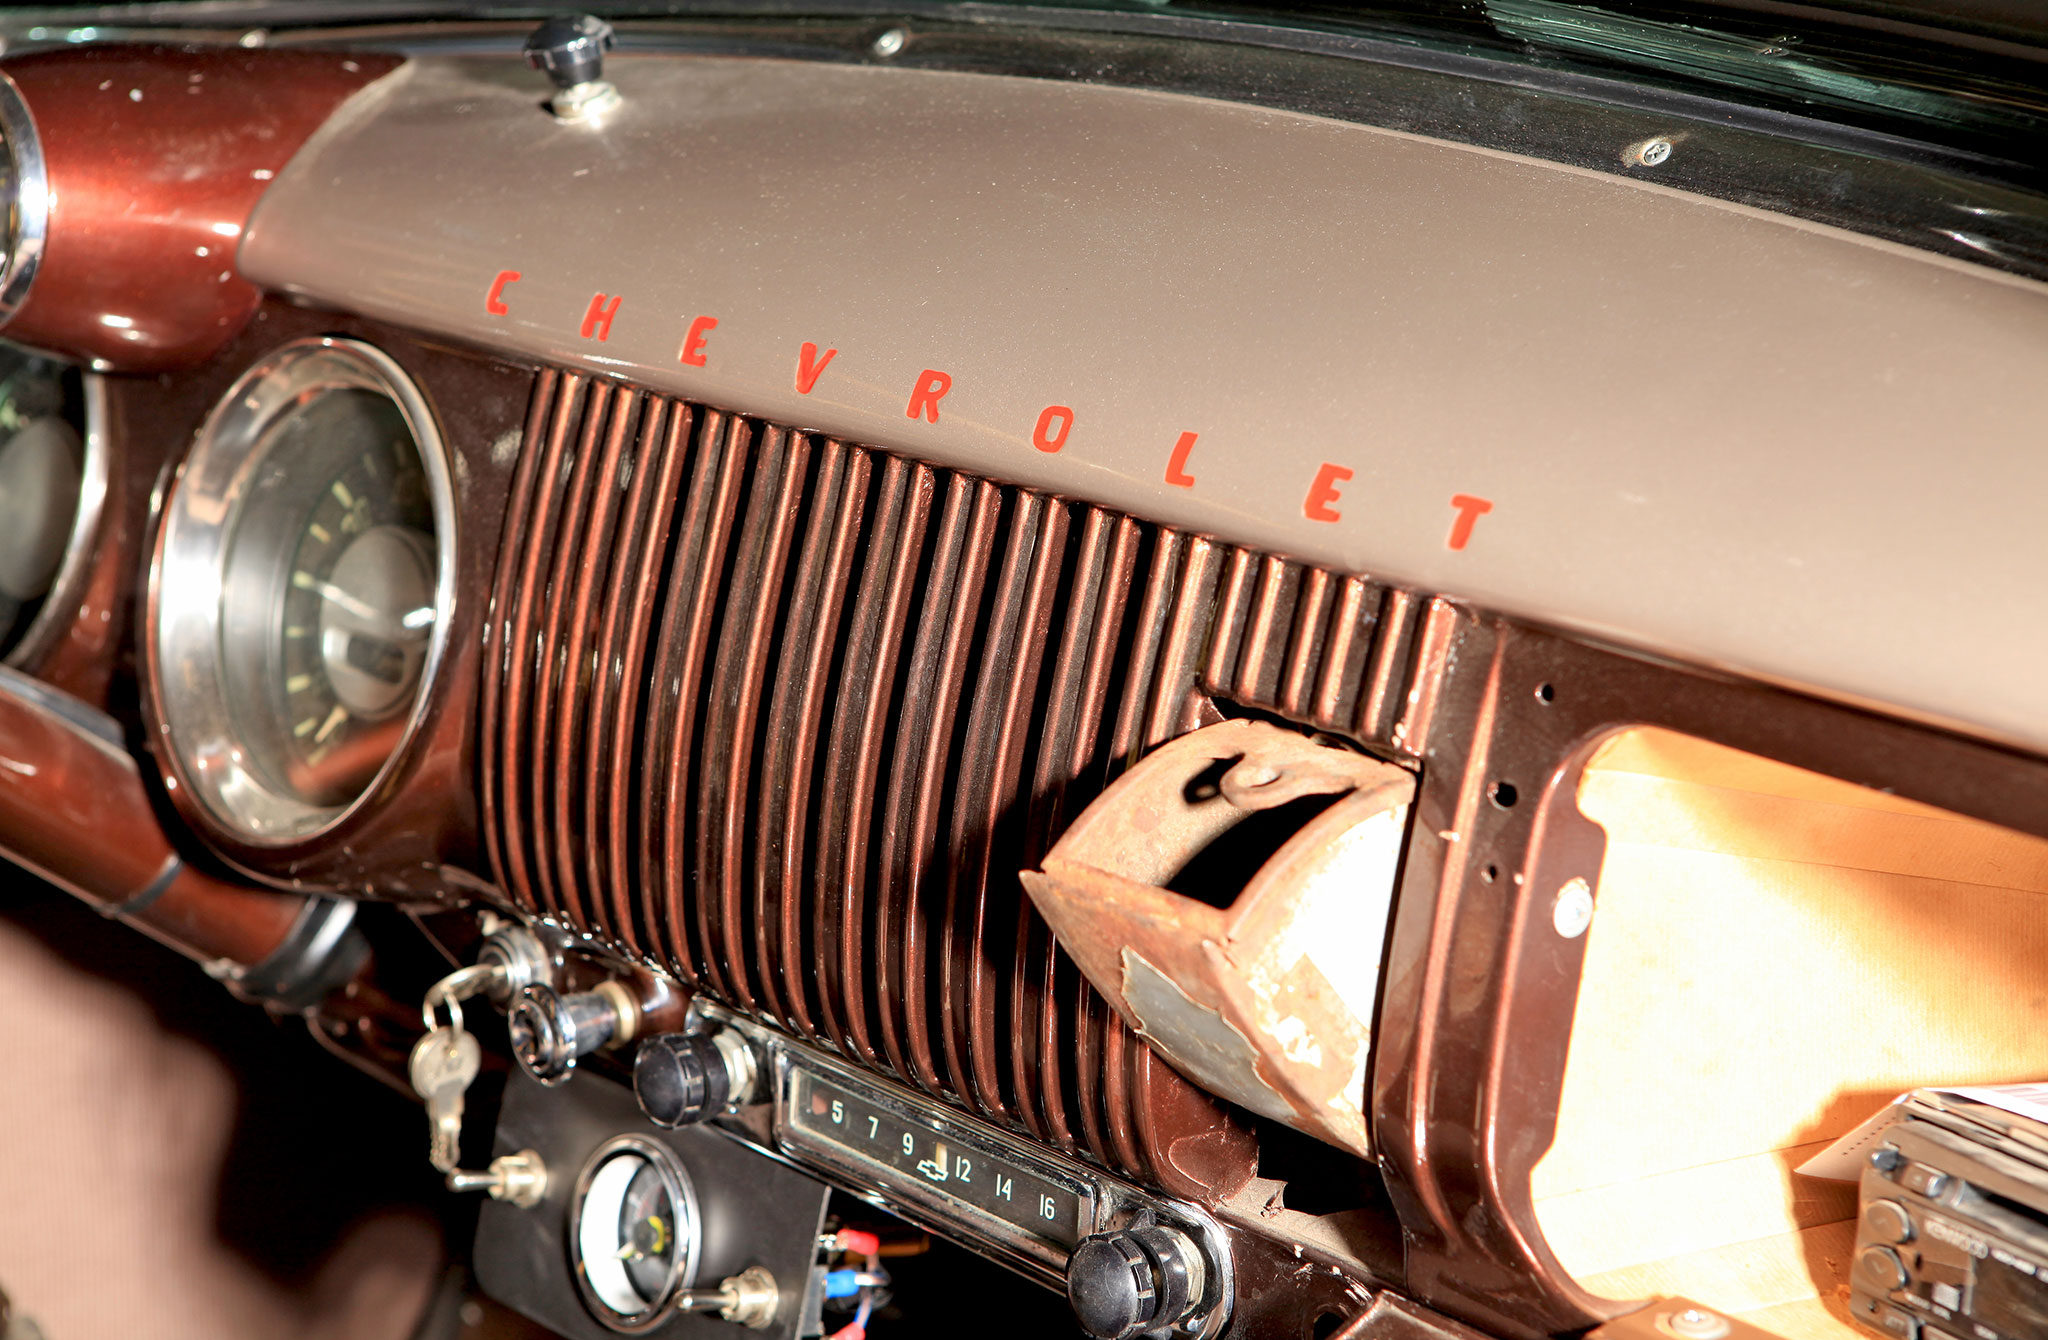 1954 Chevrolet Stepside 3100 & Suburban - Stepside And The Sub